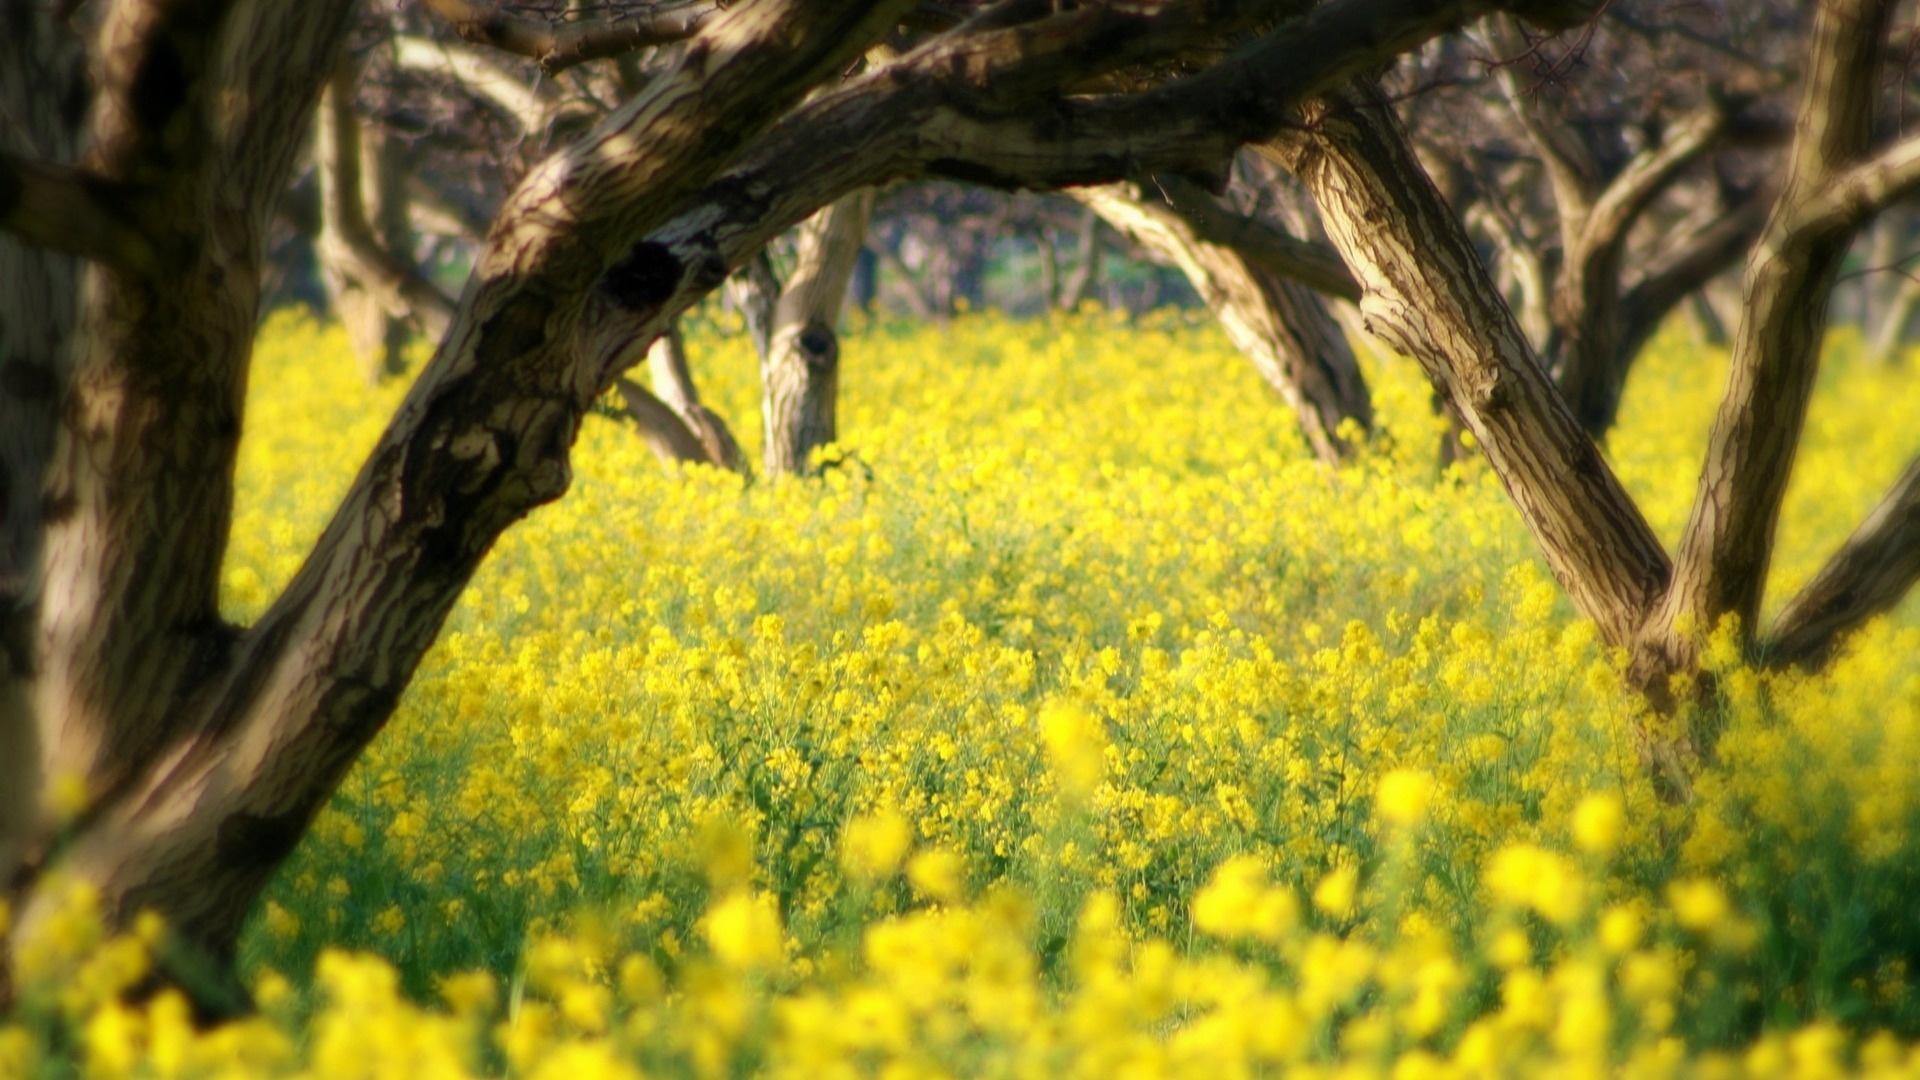 Yellow Nature wallpaper hd